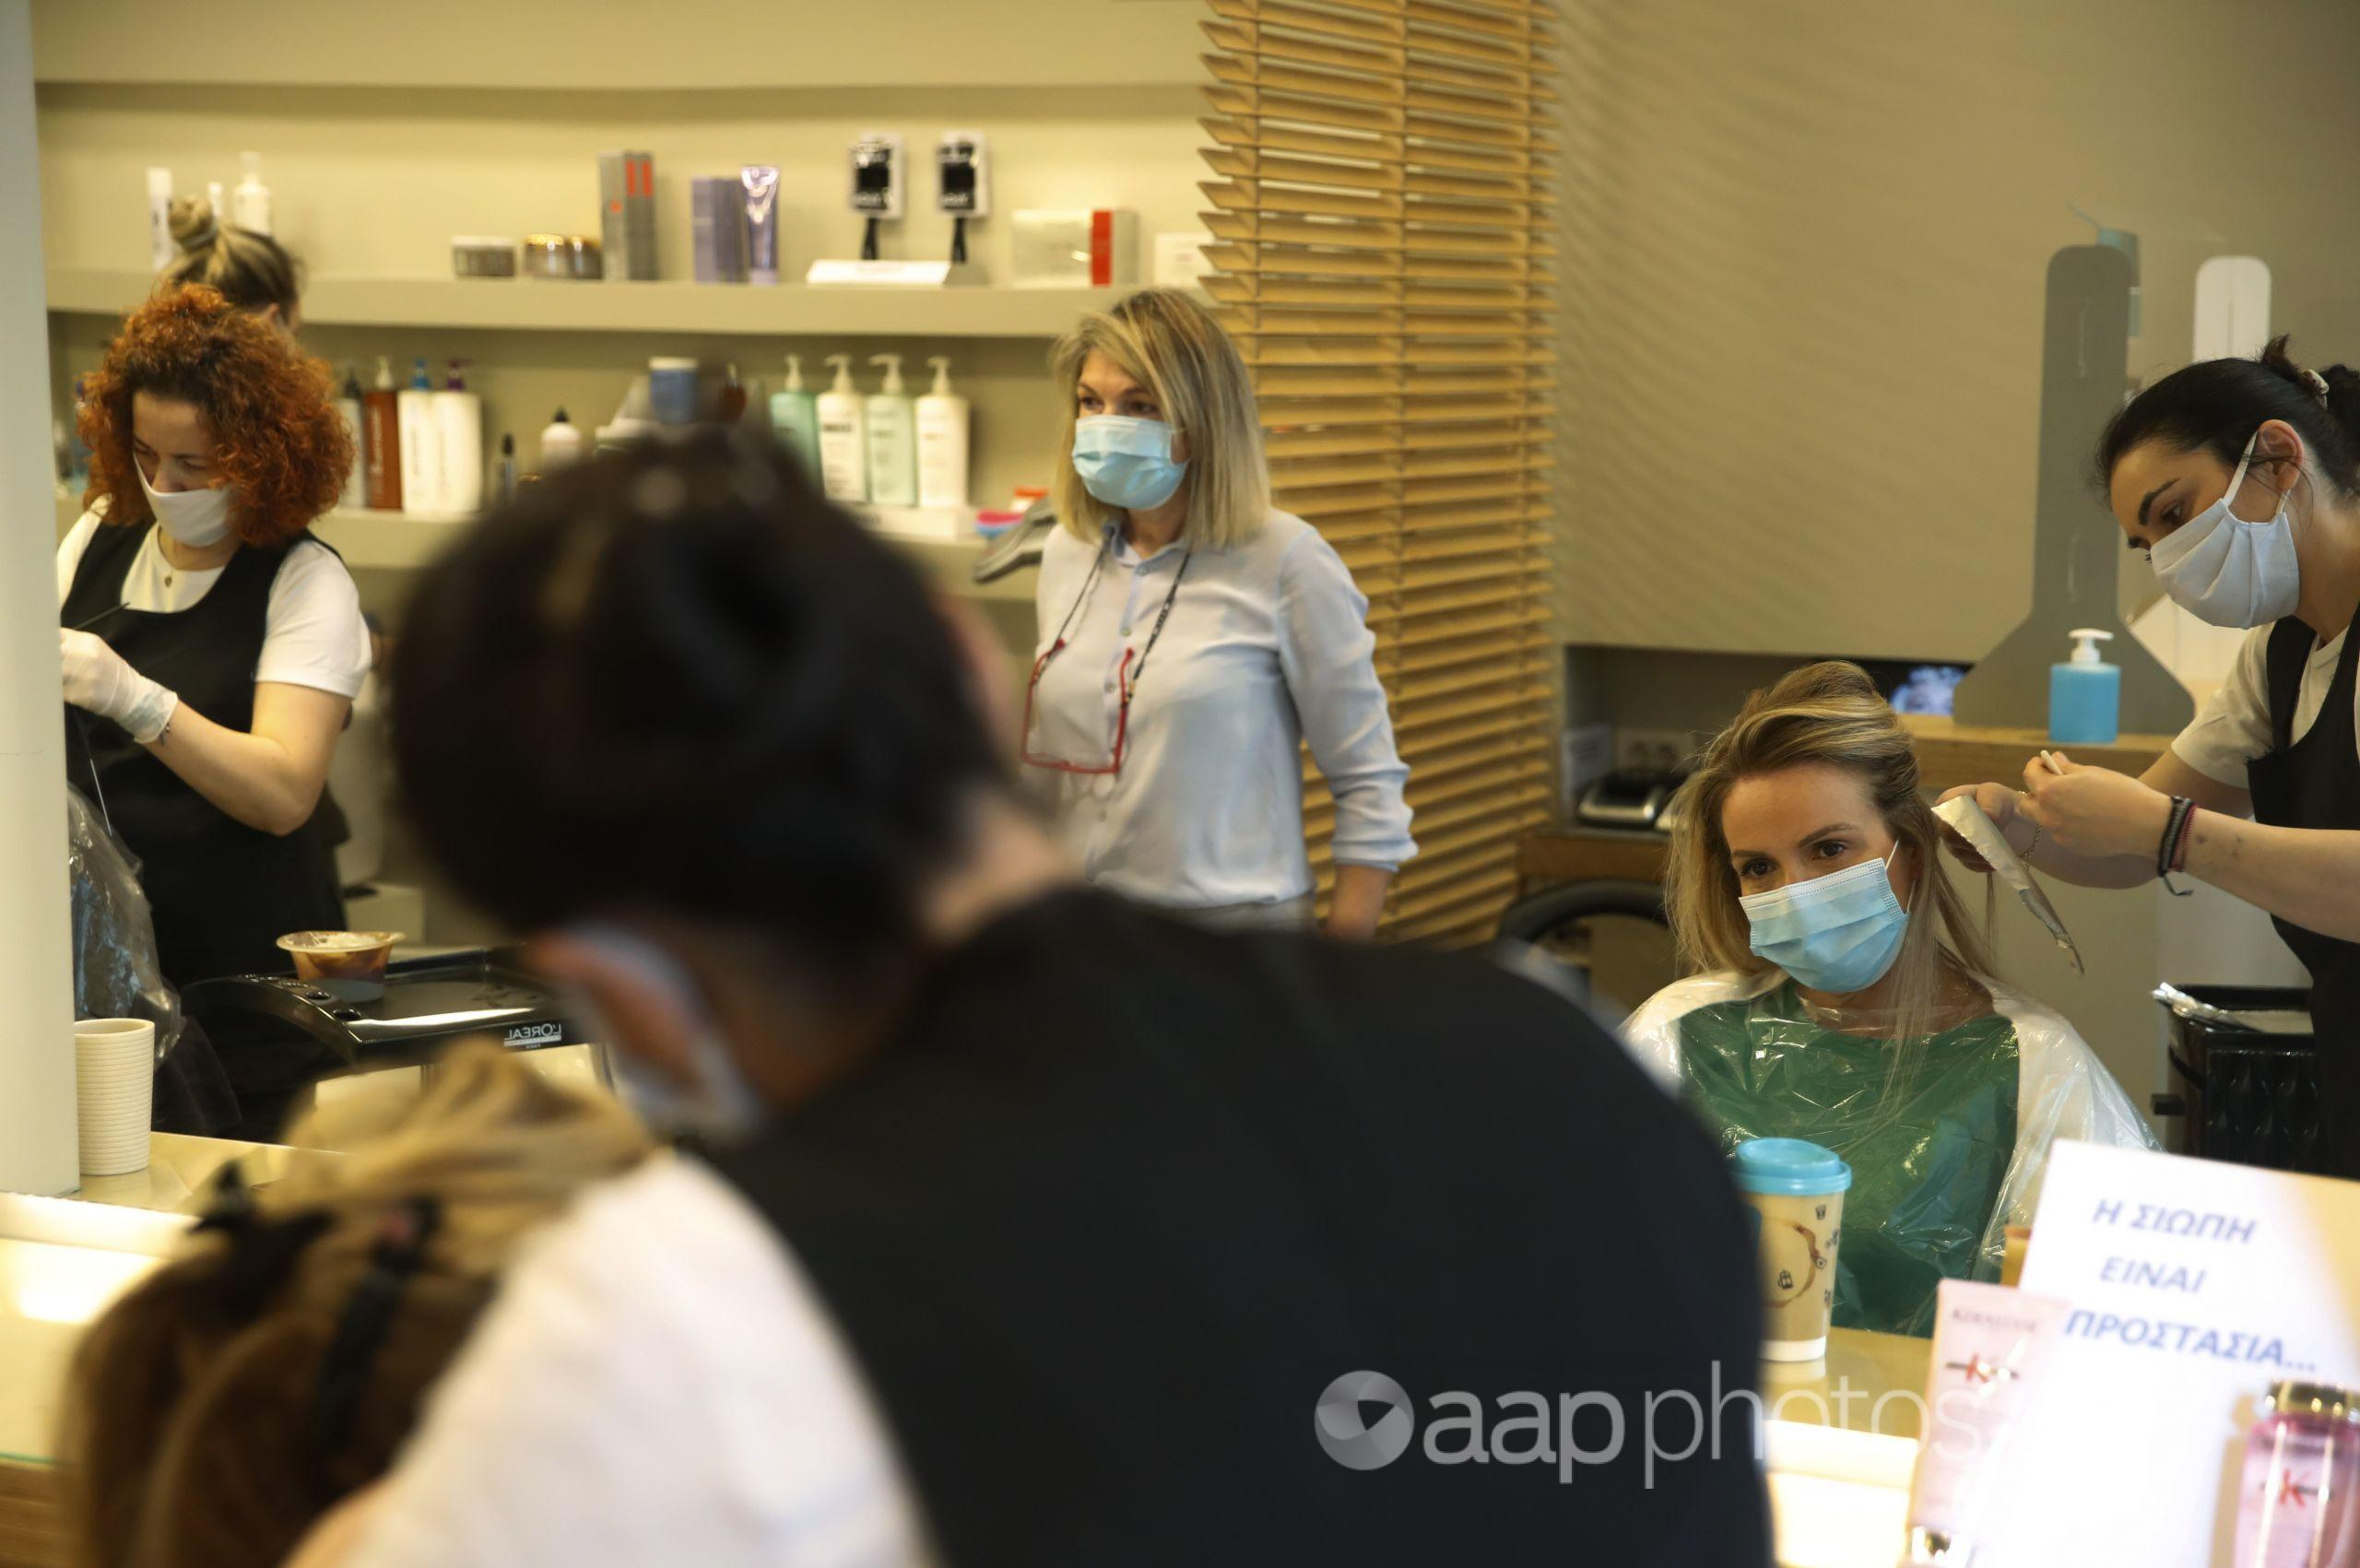 COVID-19 masks in a beauty salon